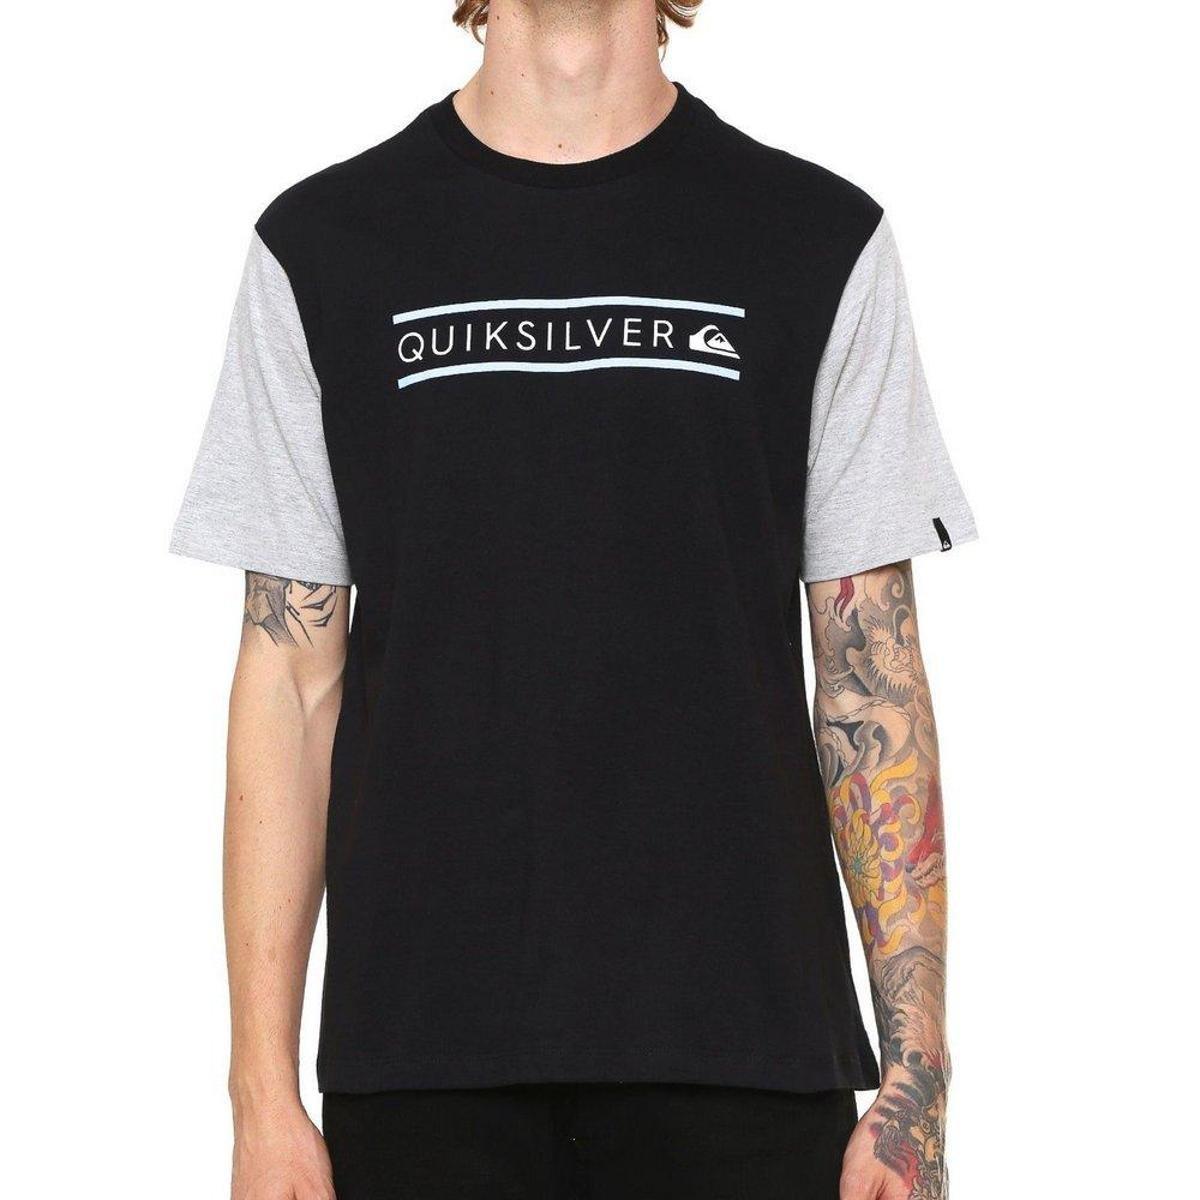 5c453490f57 Camiseta Quiksilver Schwack - Preto - Compre Agora